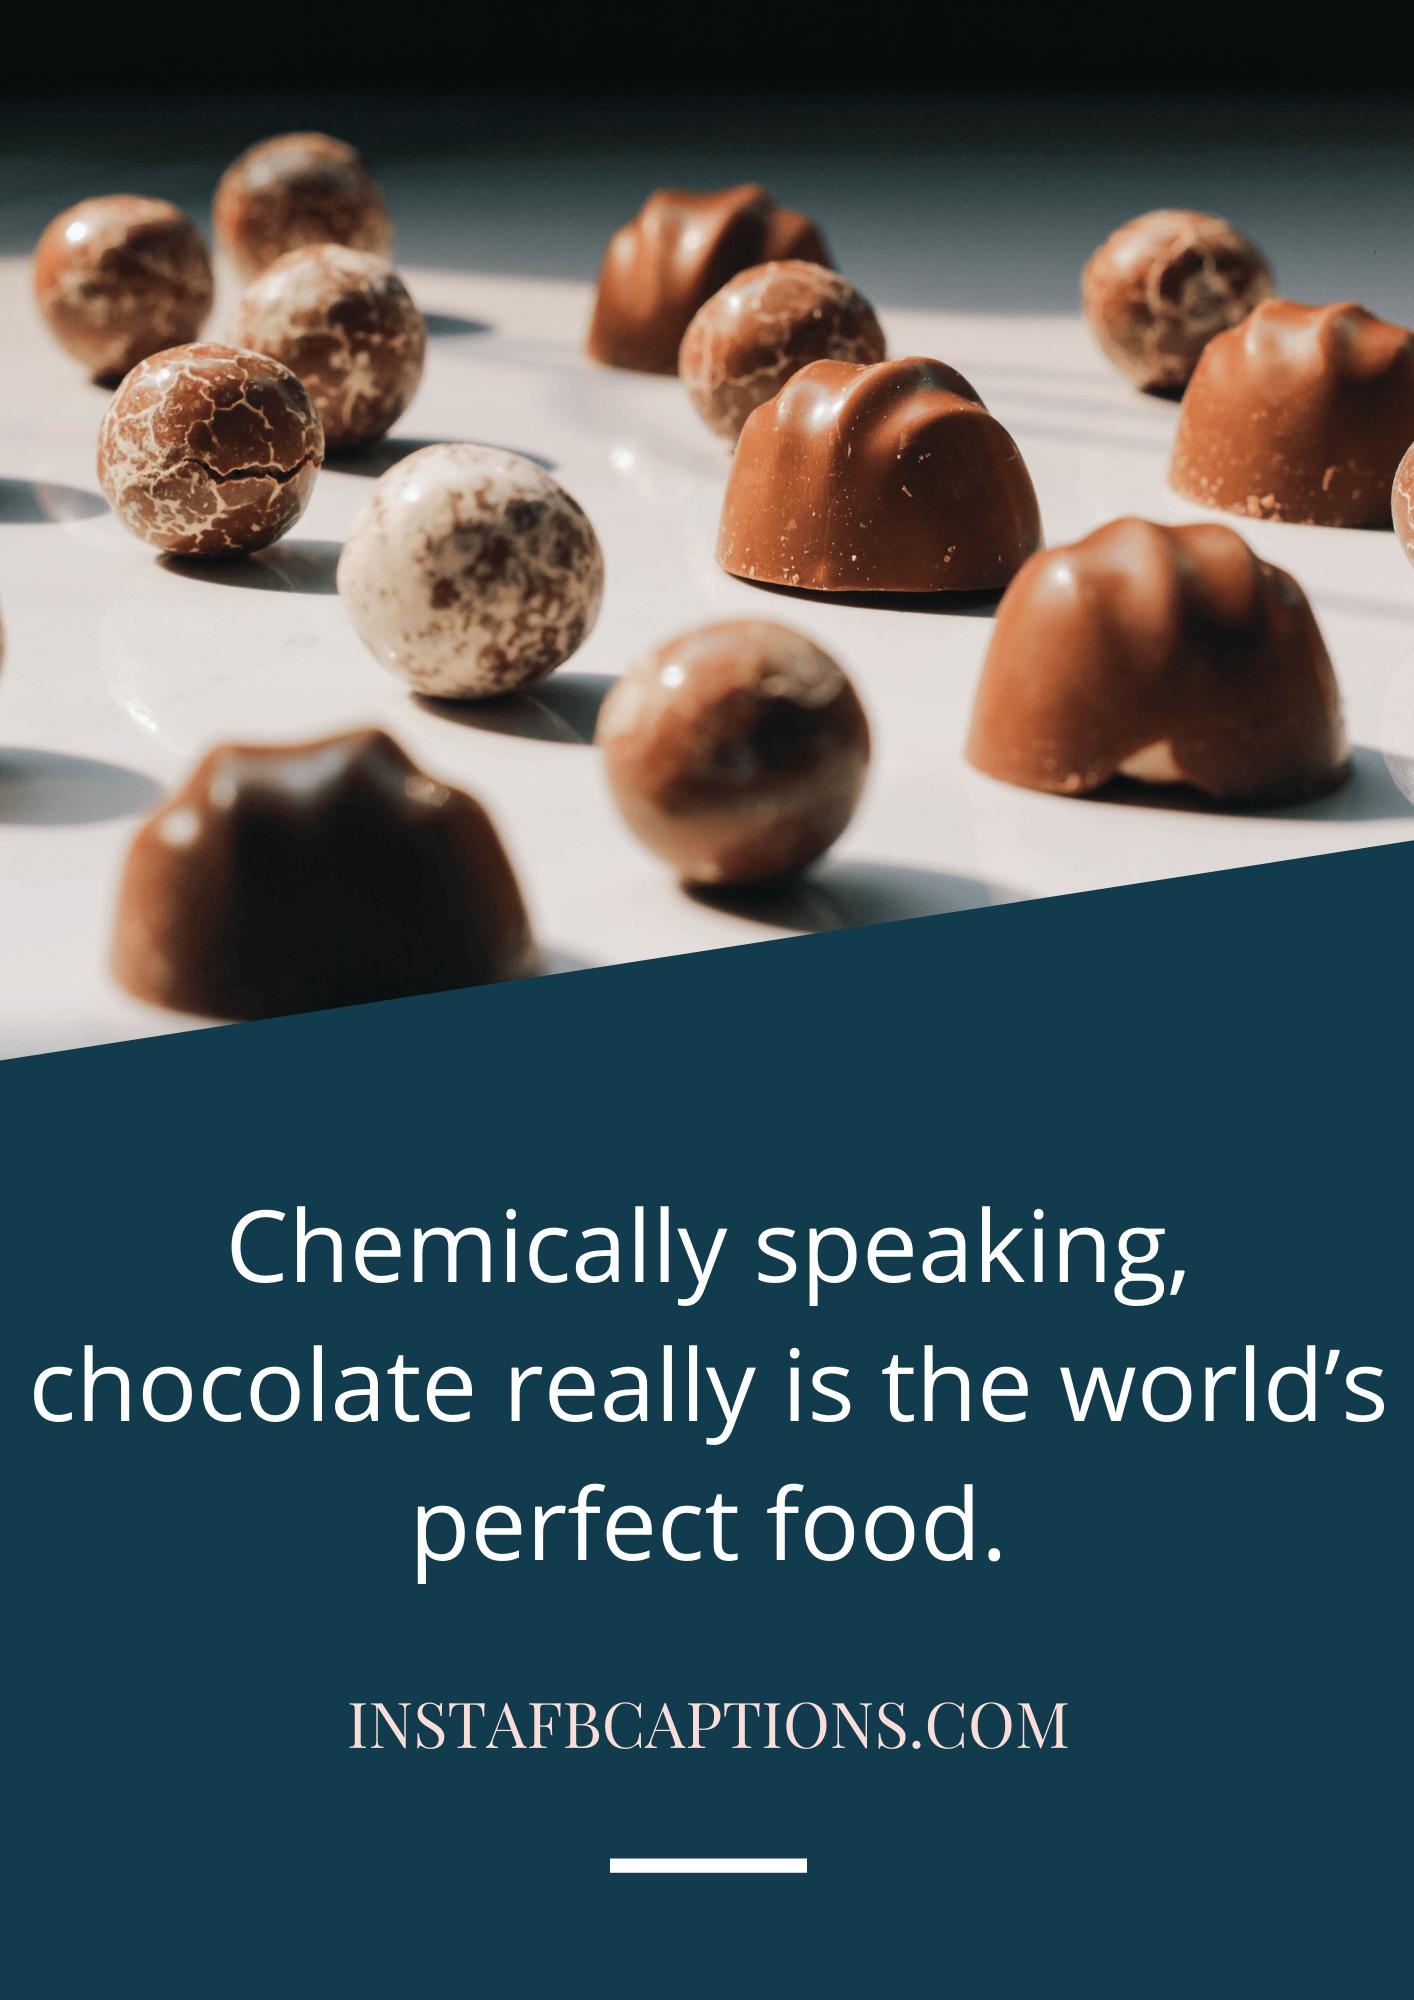 Dark Chocolate Desires Quotes  - Dark Chocolate Desires Quotes - 97+ Chocolate Lover Captions For Instagram in 2021